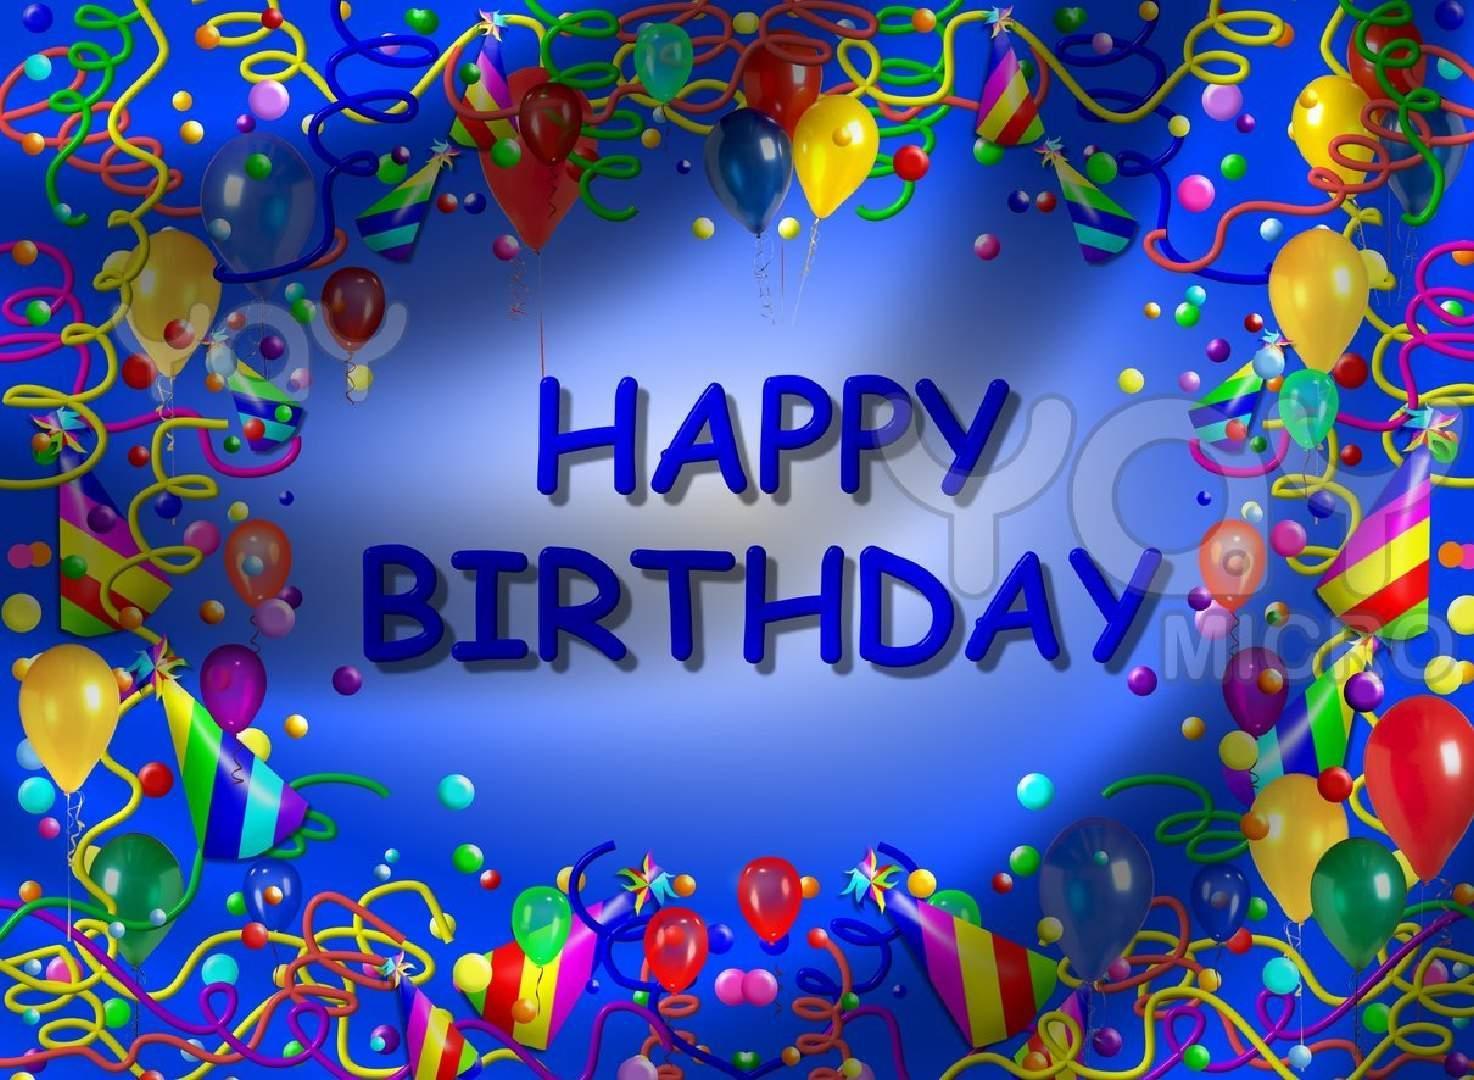 Free Birthday Background Images